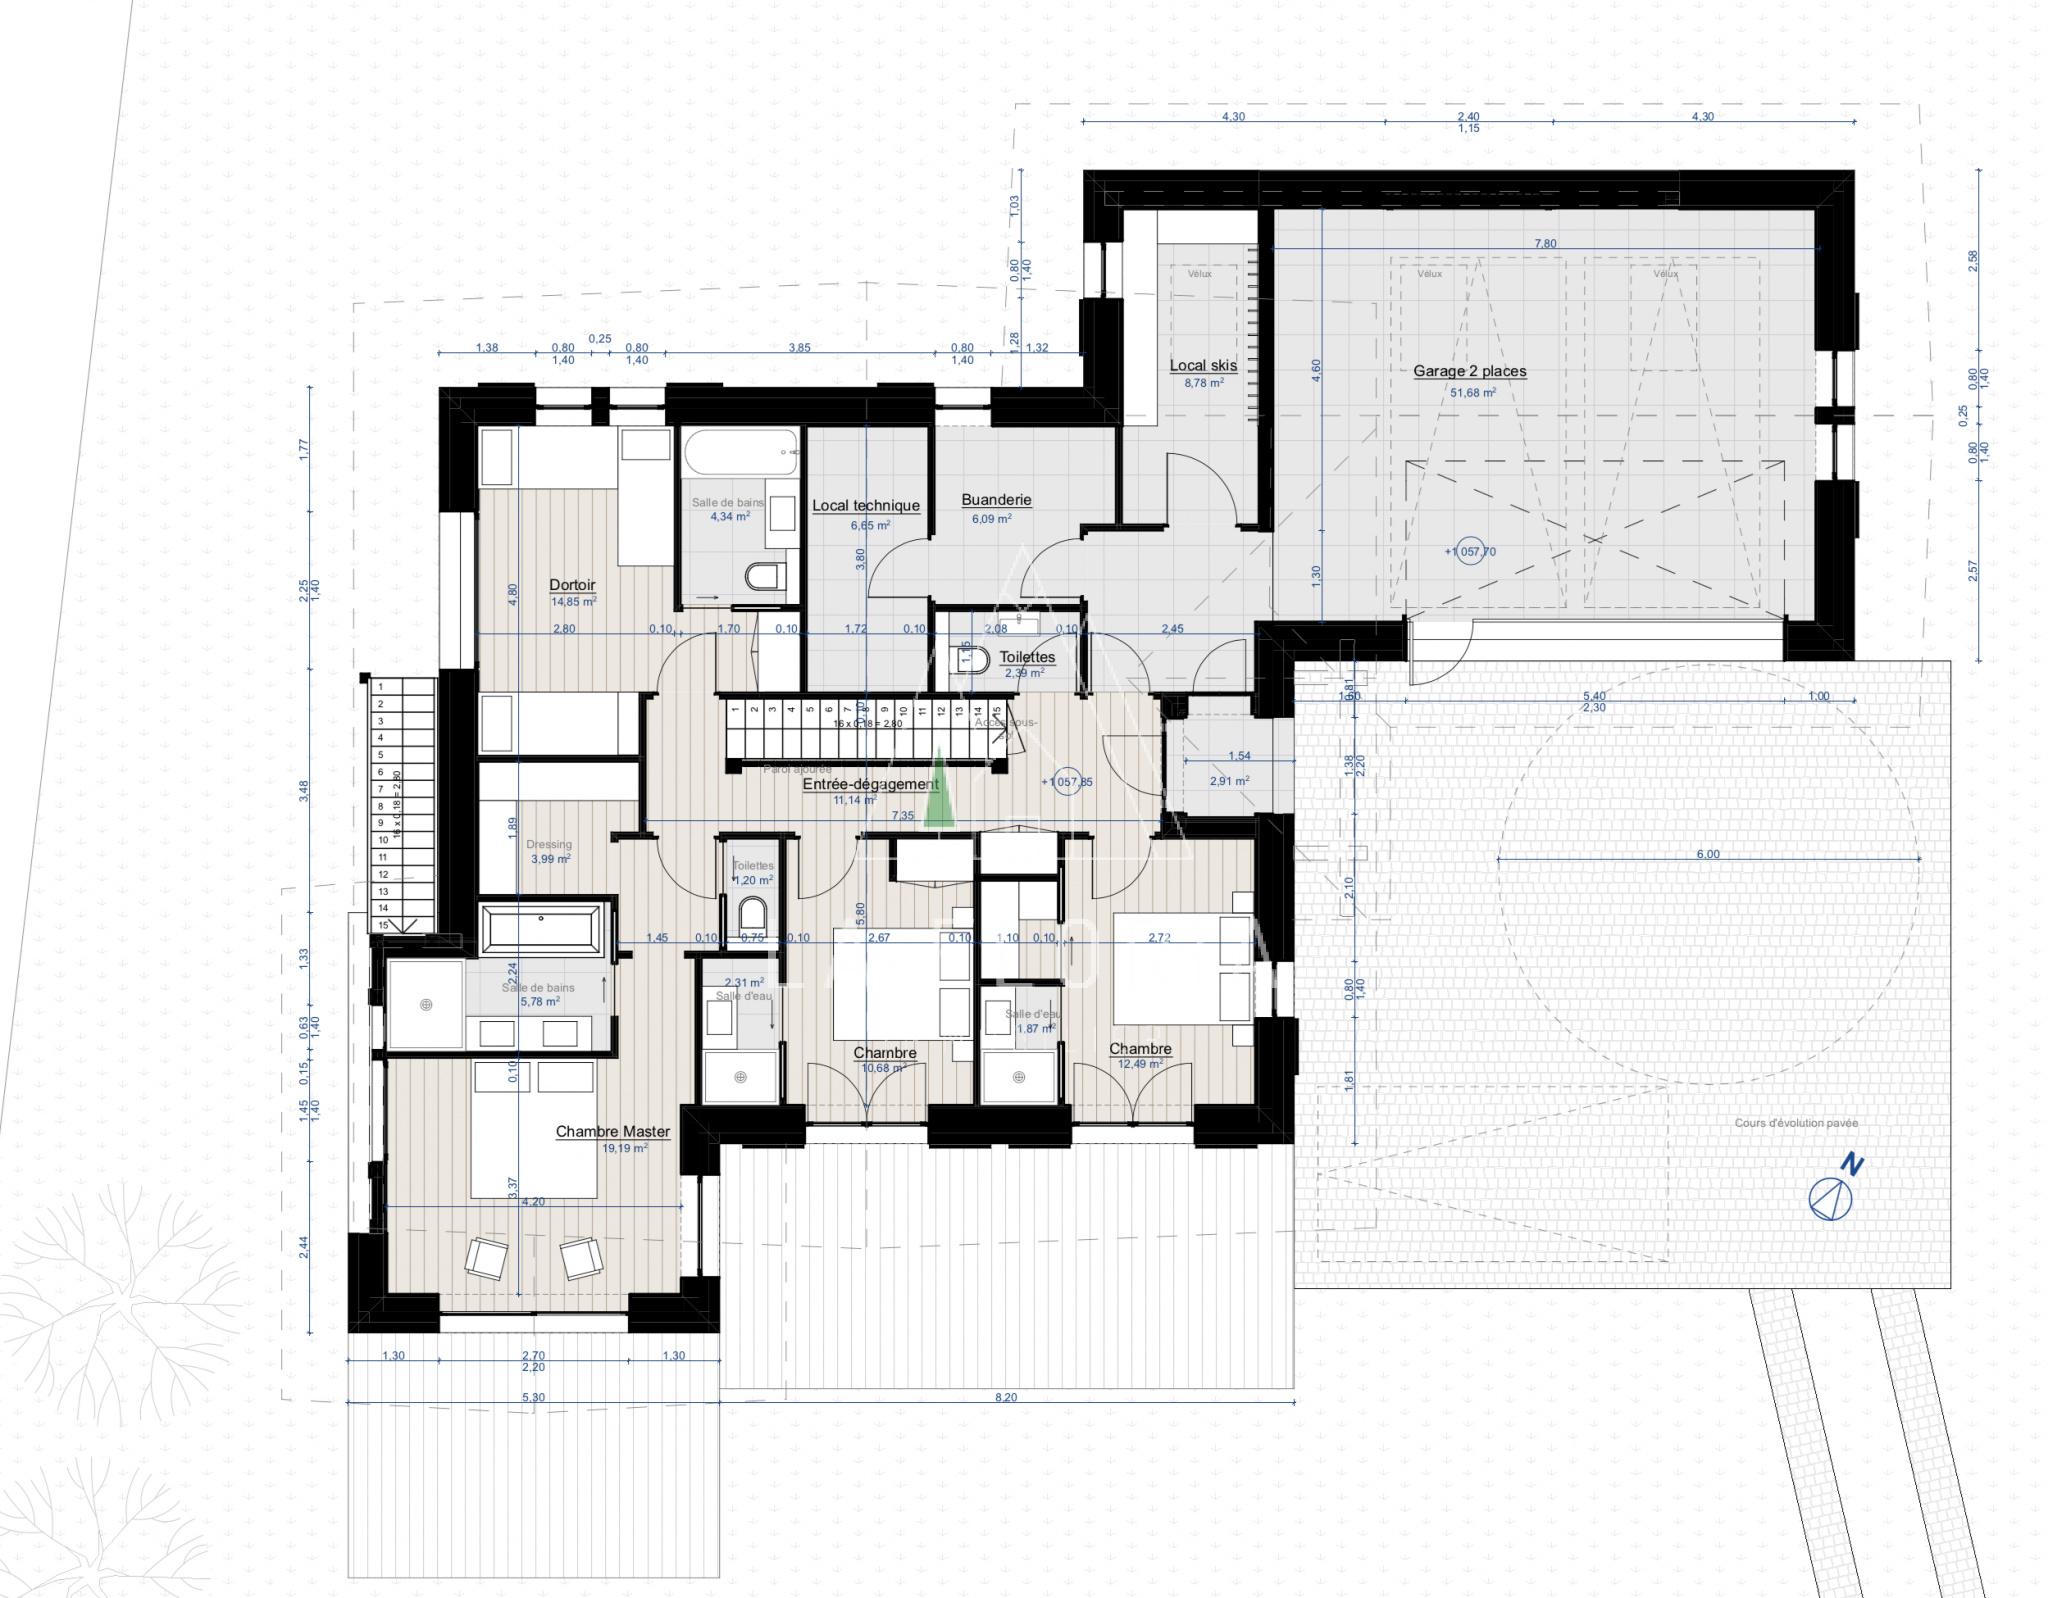 UNDER OFFER / LUXURY NEW BUILD CHALET LIARET B - LES PRAZ CHAMONIX